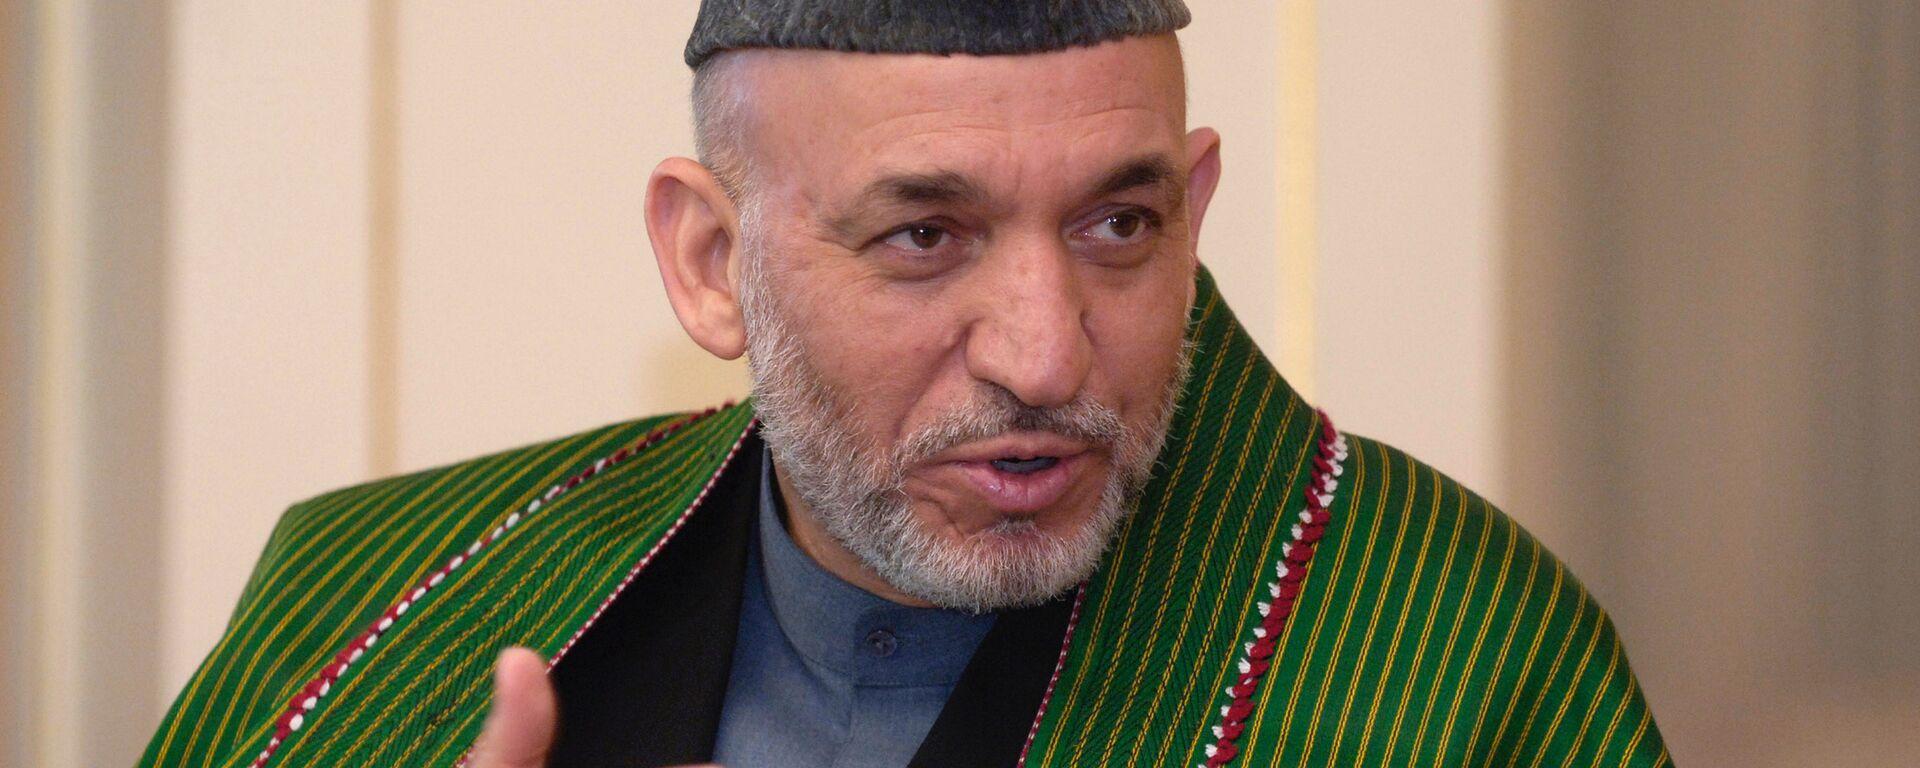 Ex presidente Afghanistan Hamid Karzai - Sputnik Italia, 1920, 26.08.2021